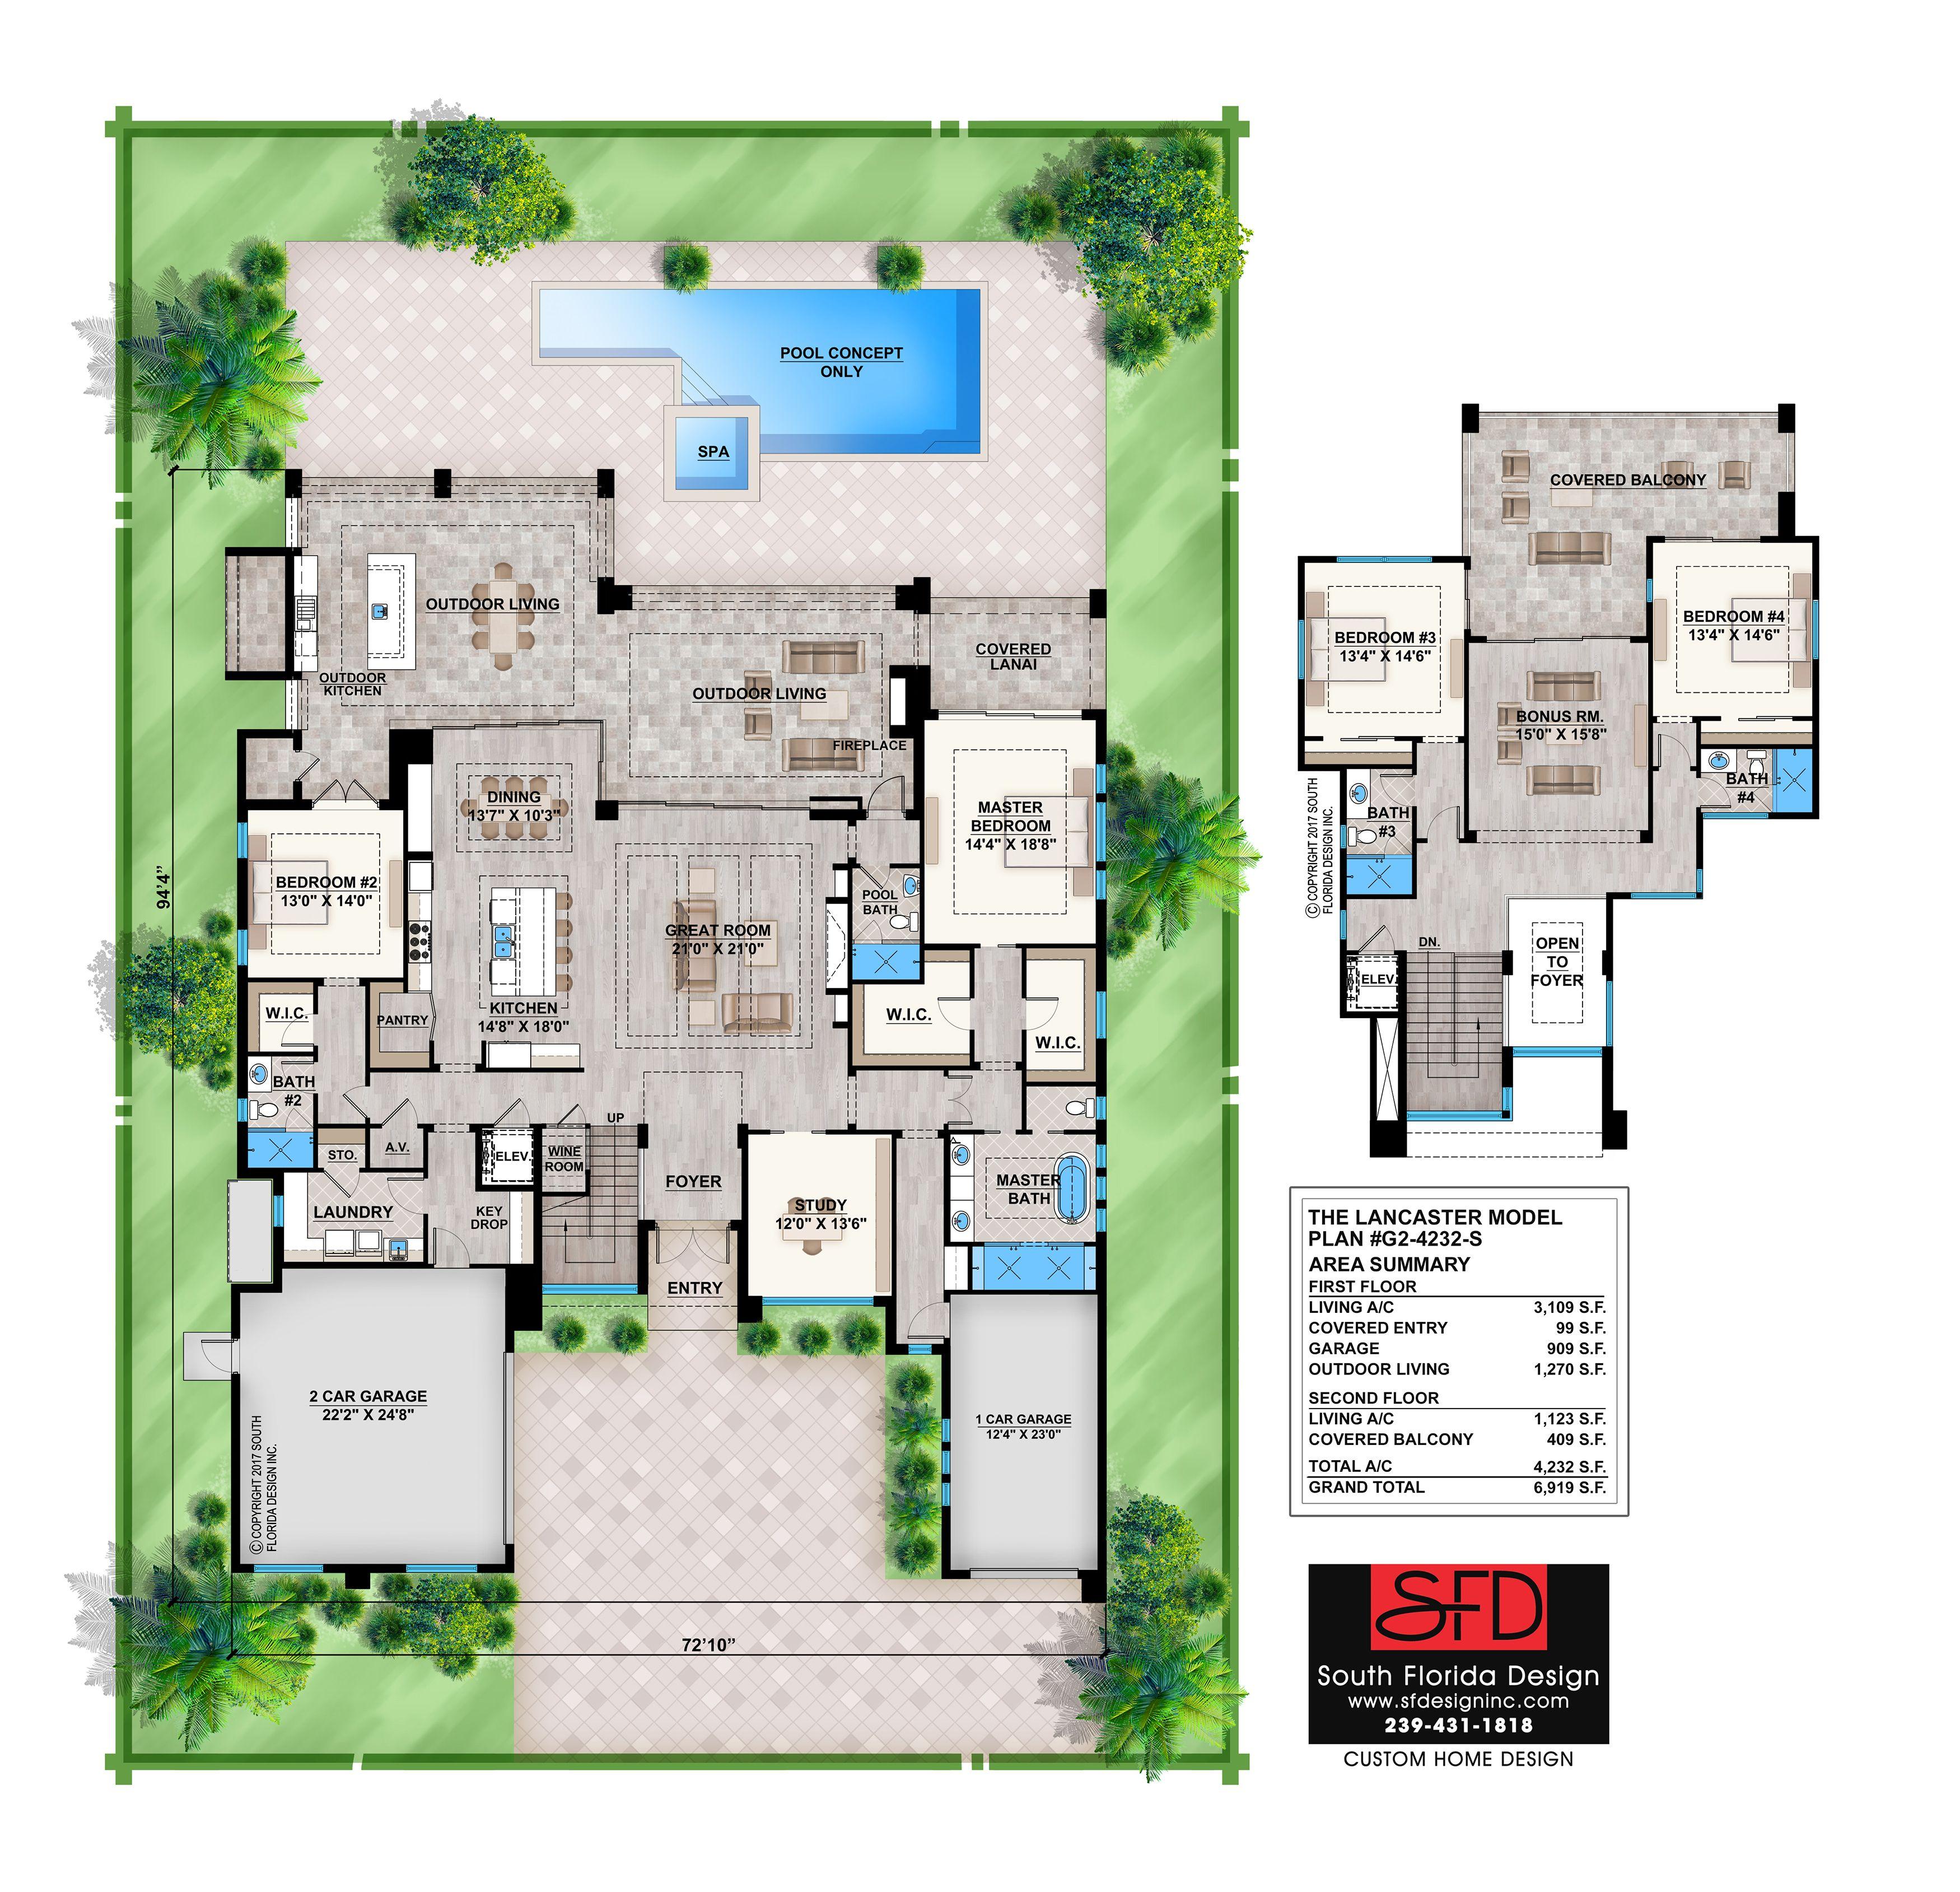 South Florida Designs – Lancaster G2 4232 S